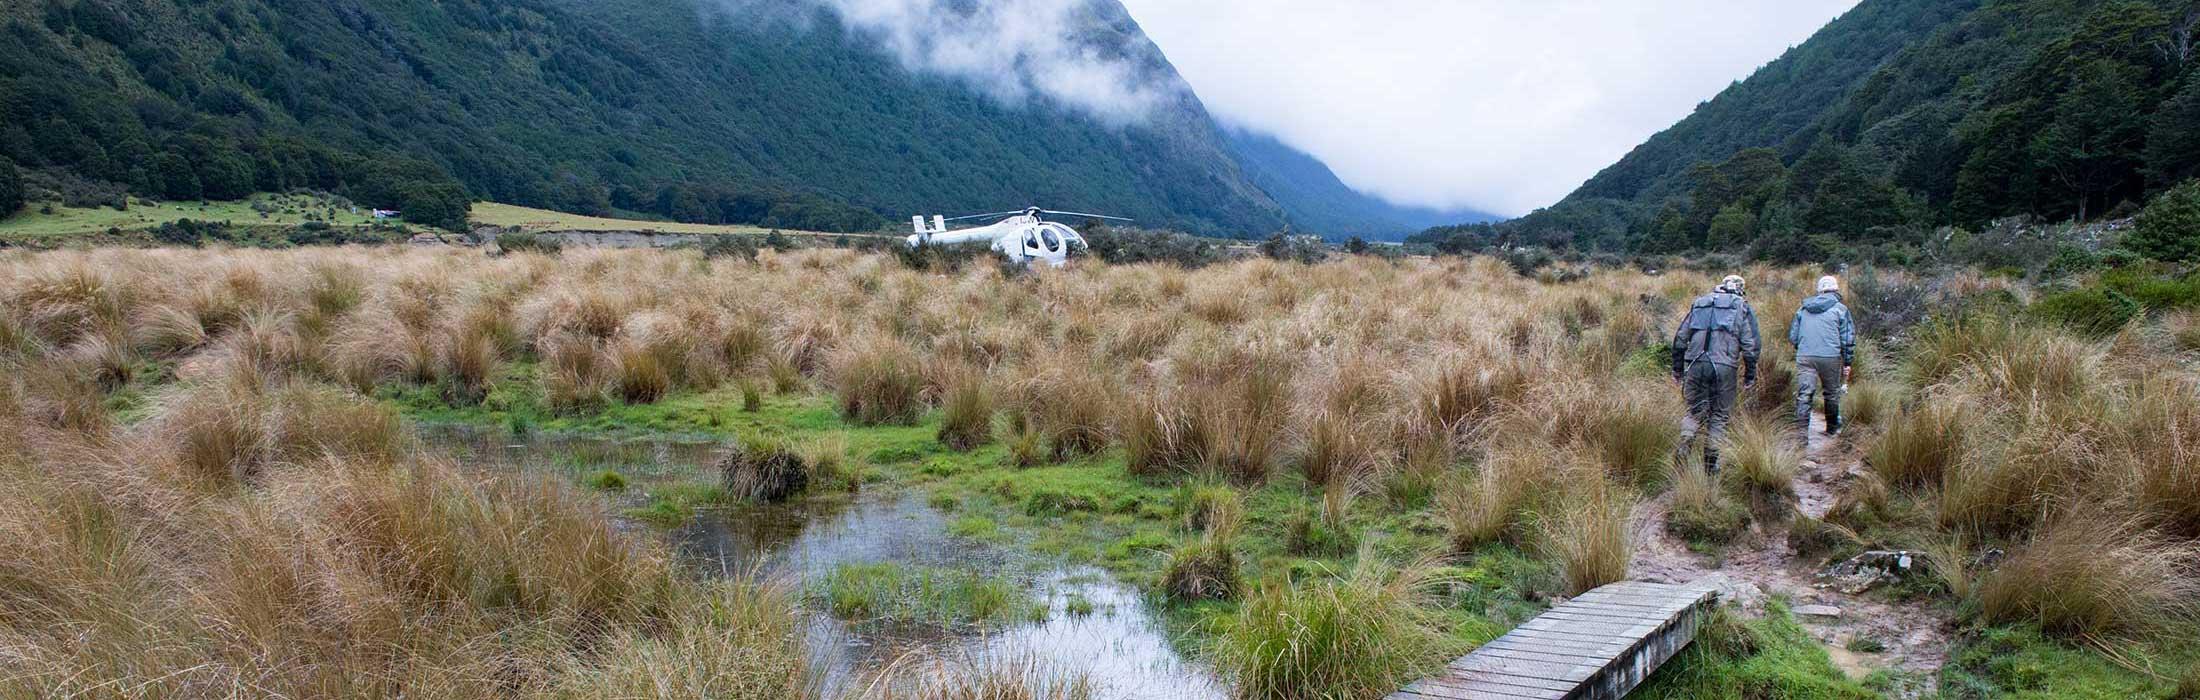 ©Klug-Photos-NZ-2016-182.jpg